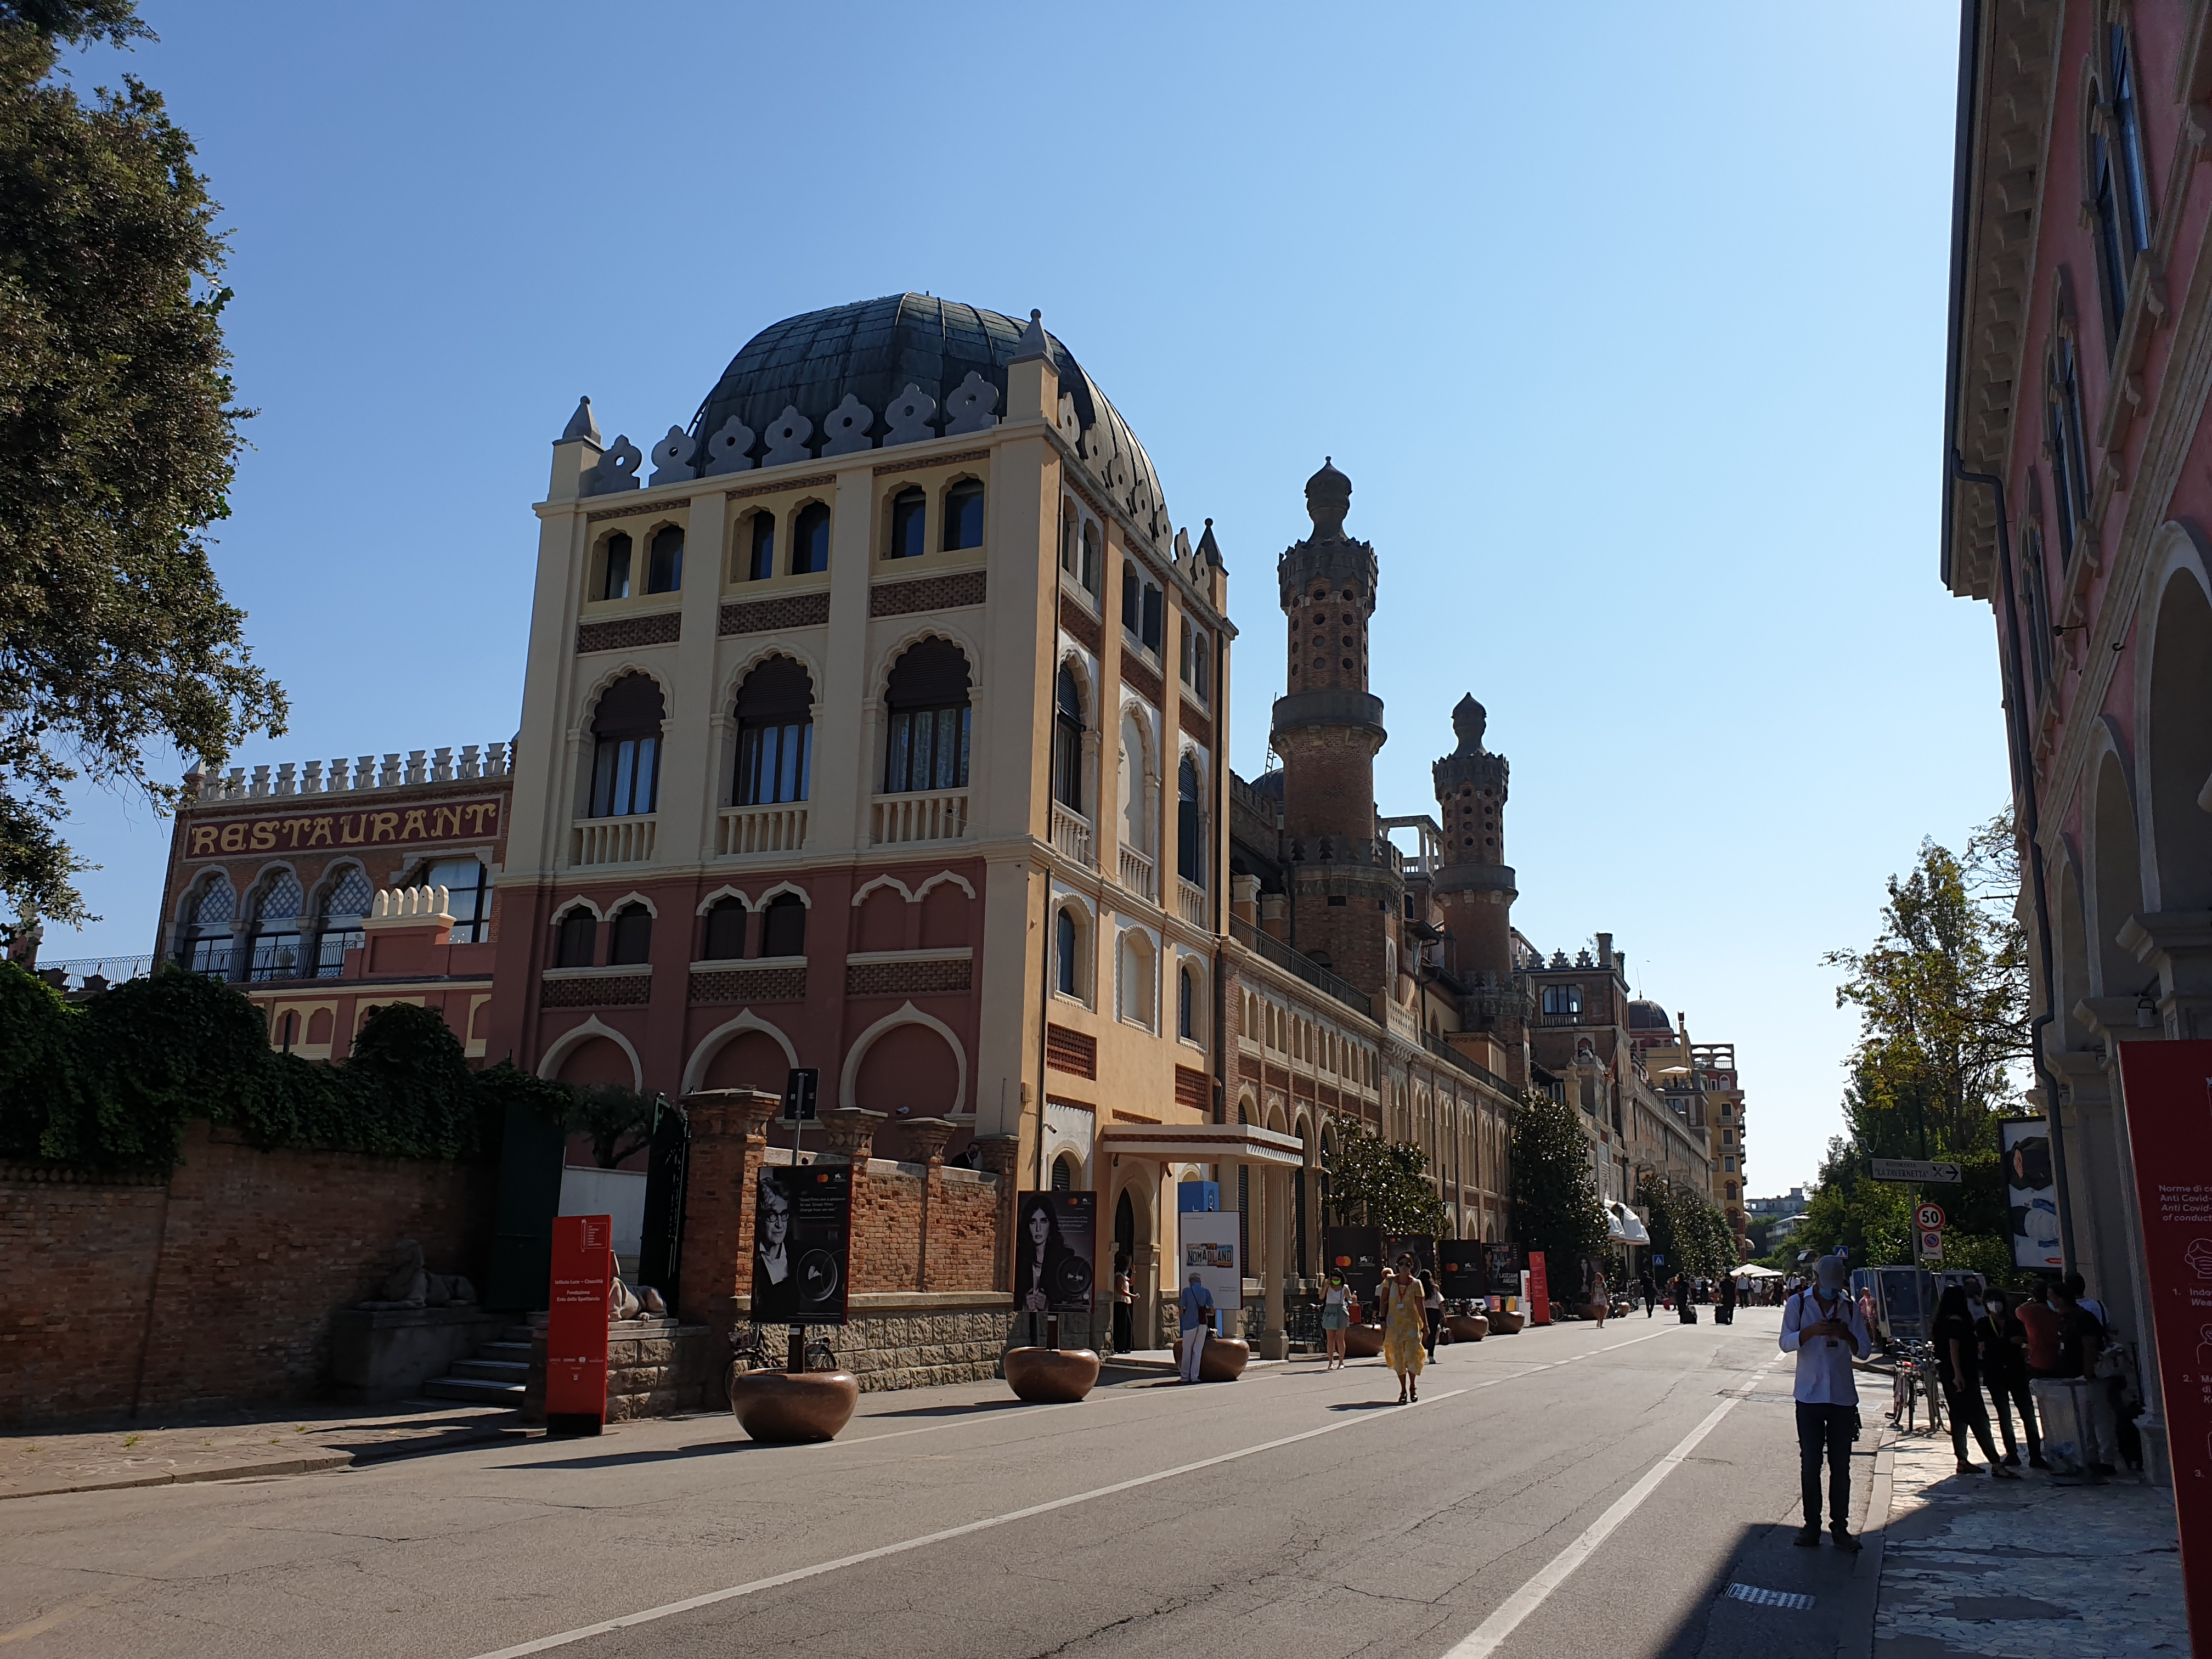 Hotel Excelsior - Lido di Venezia